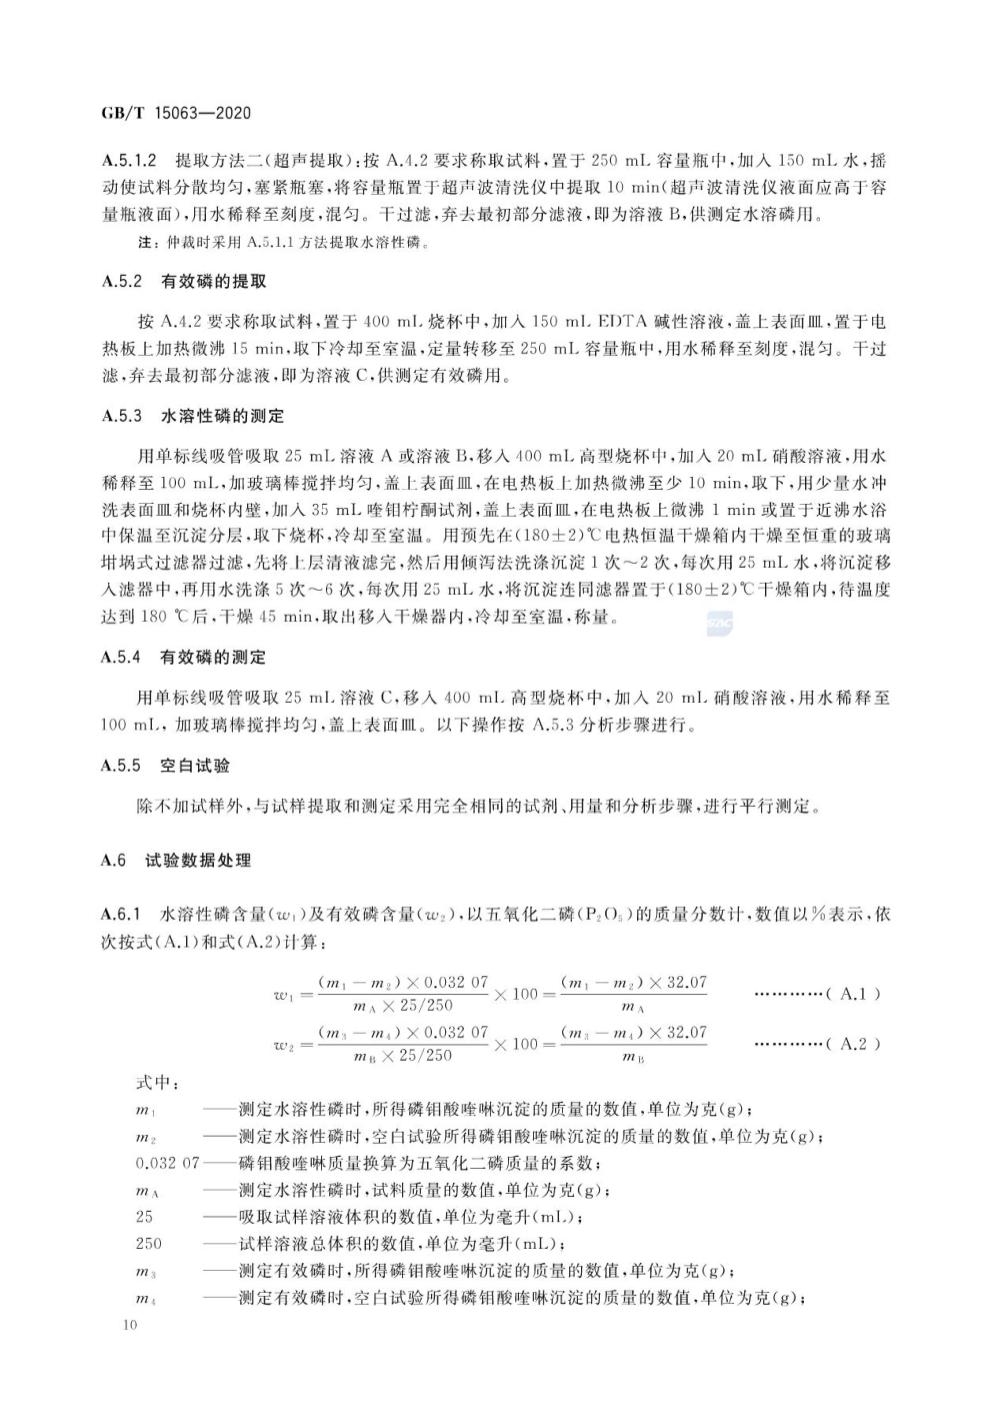 GBT15063-2020复合肥料